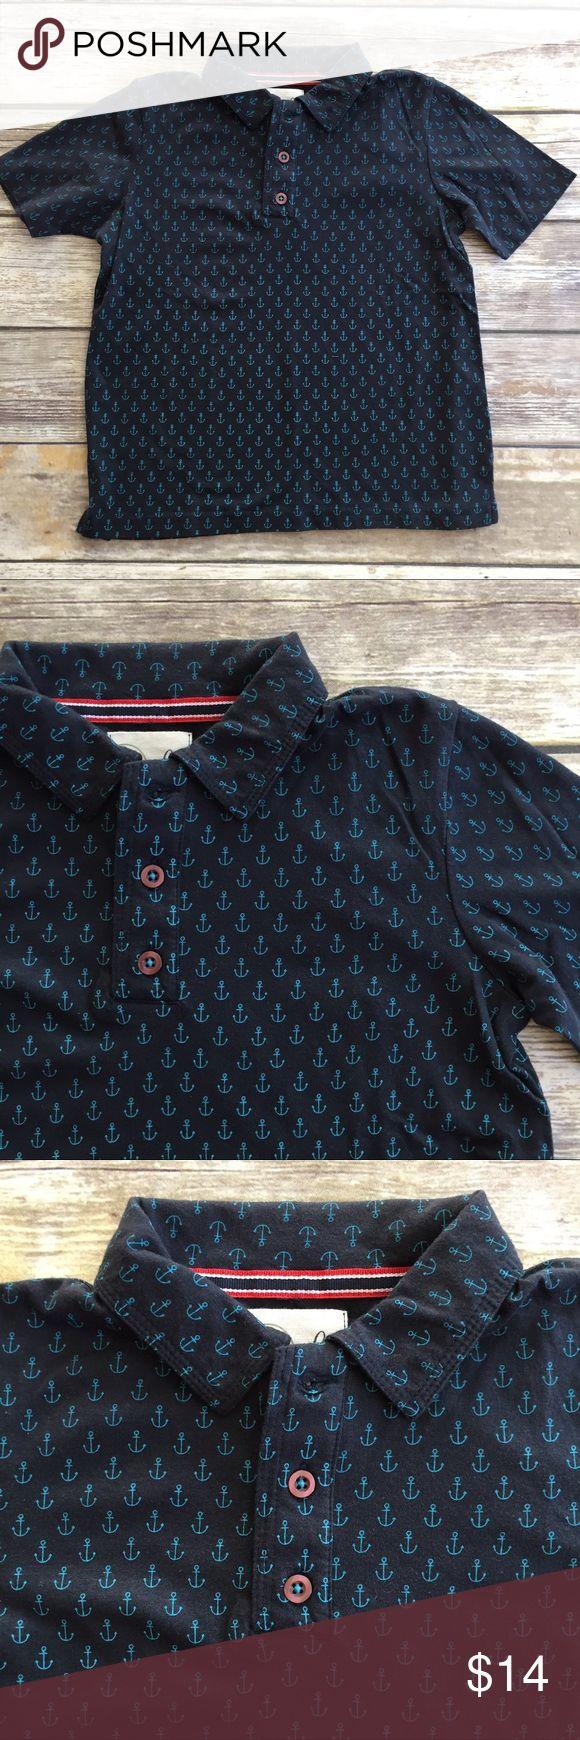 Peek Anchor Polo Navy blue polo collar shirt with light blue Anchor print. VGUC. Boys M (6/7) Peek Shirts & Tops Polos